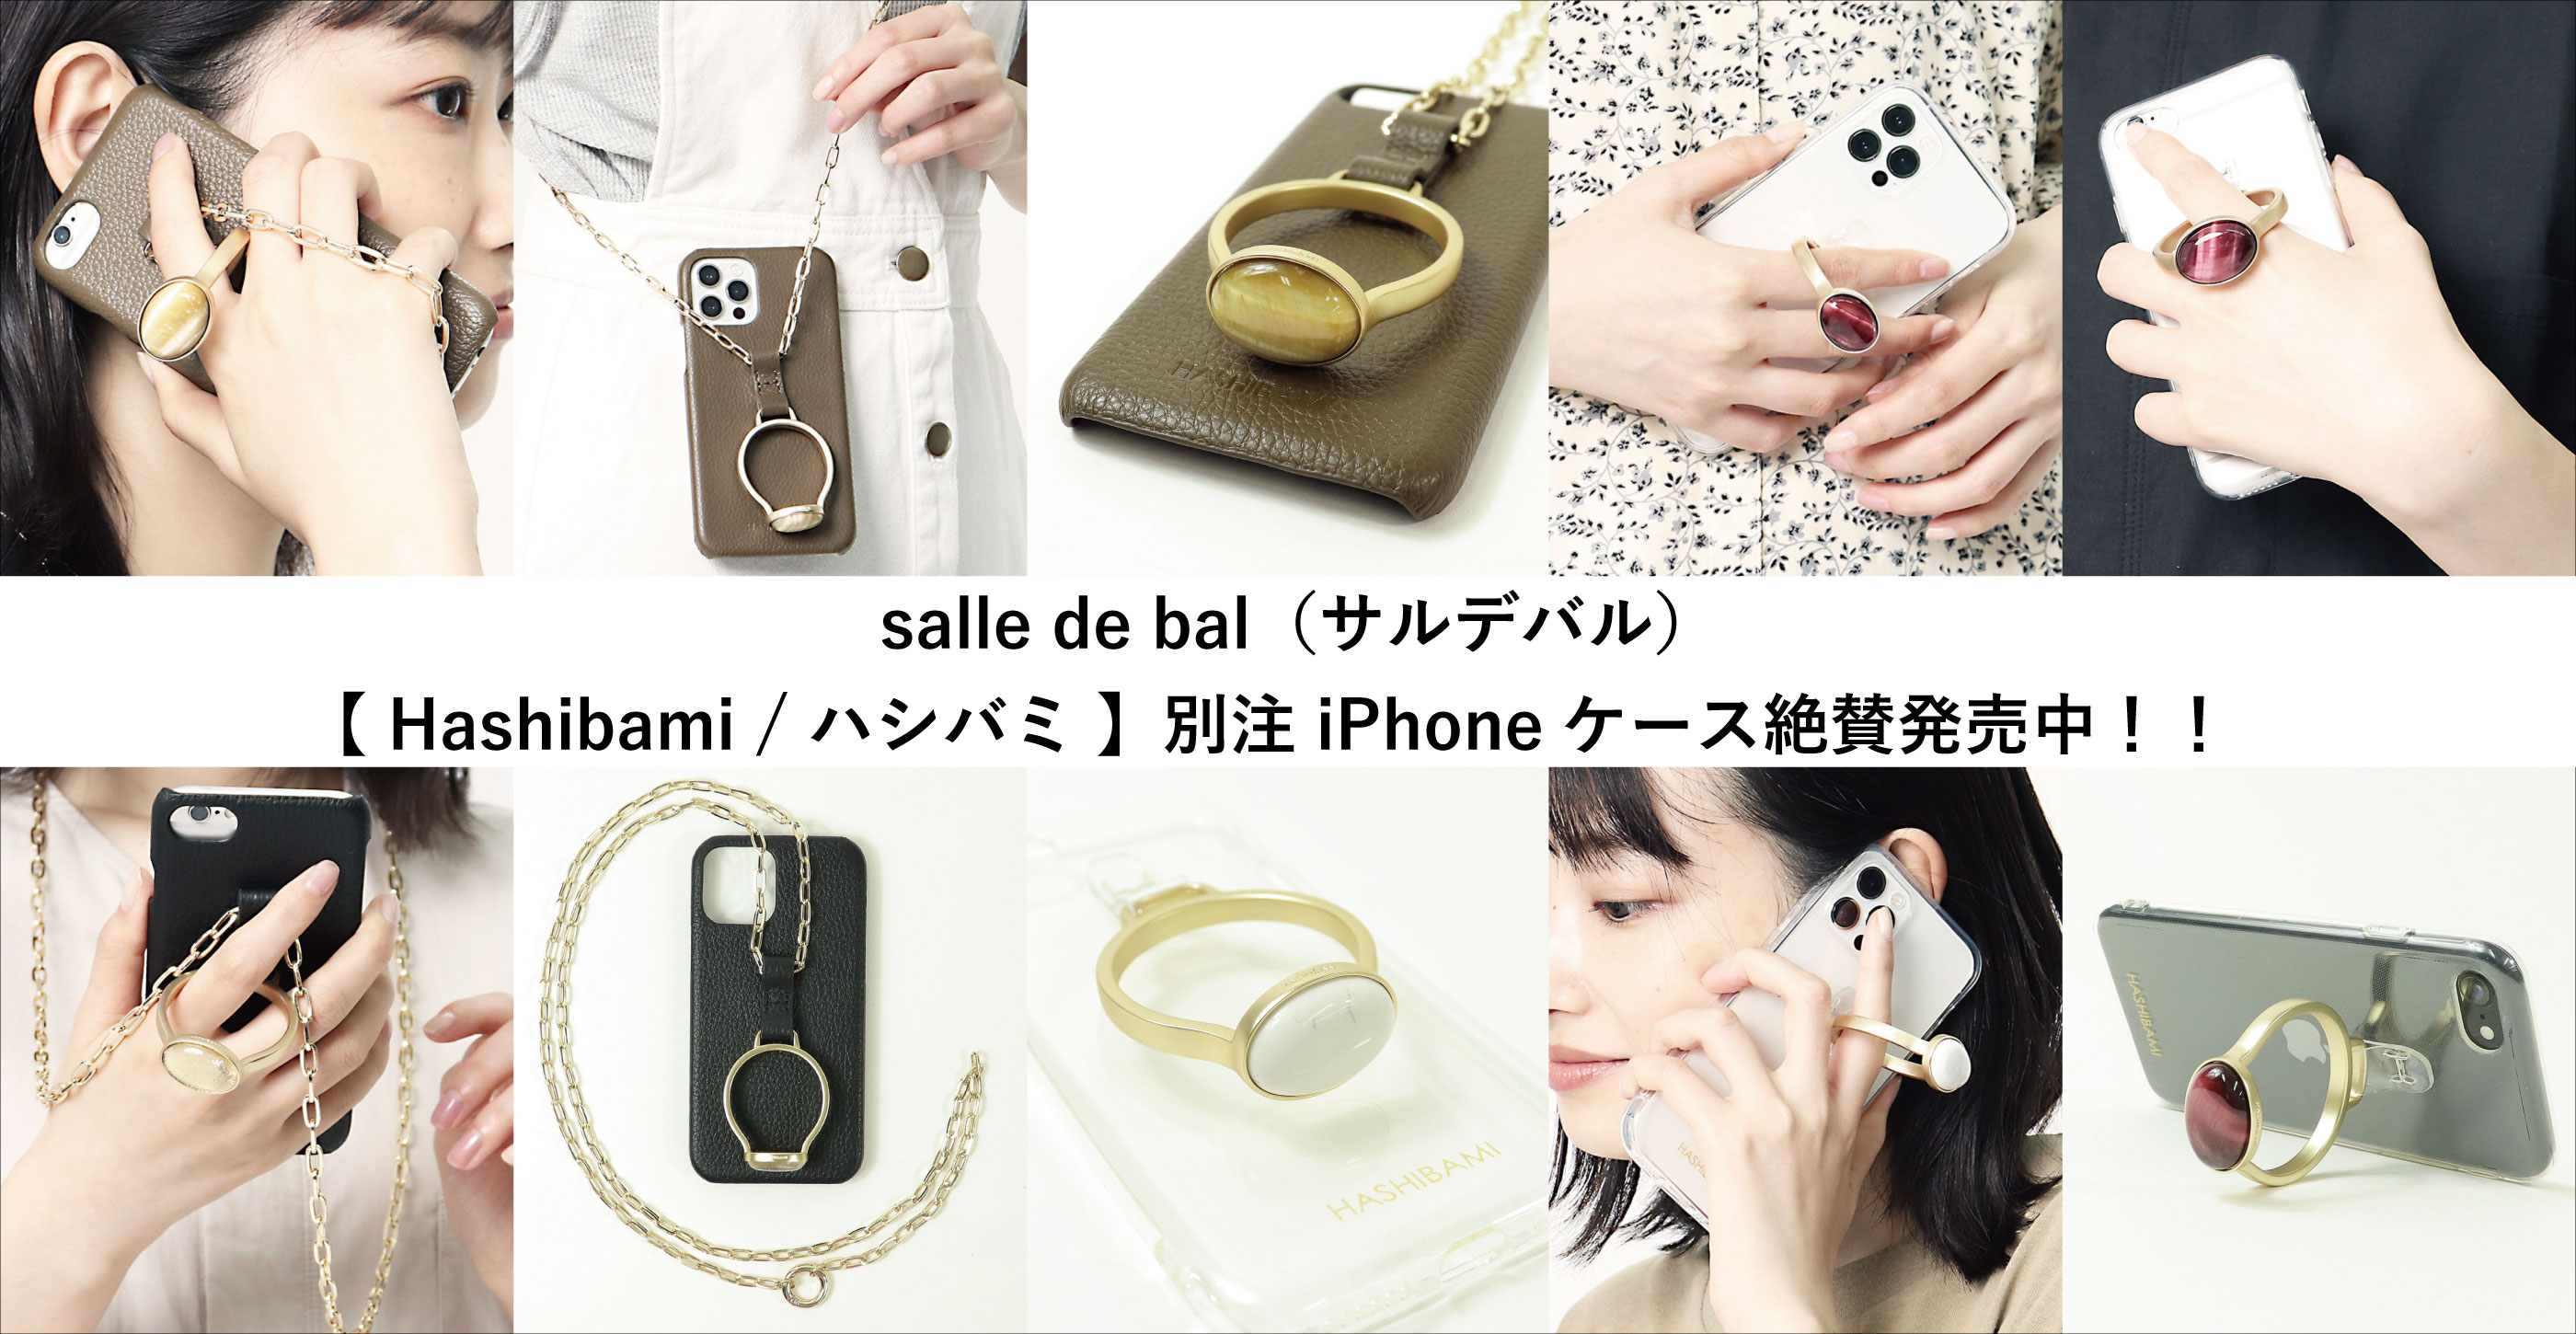 salle de bal(サルデバル)【 Hashibami / ハシバミ 】別注 iPhoneケース絶賛発売中!!